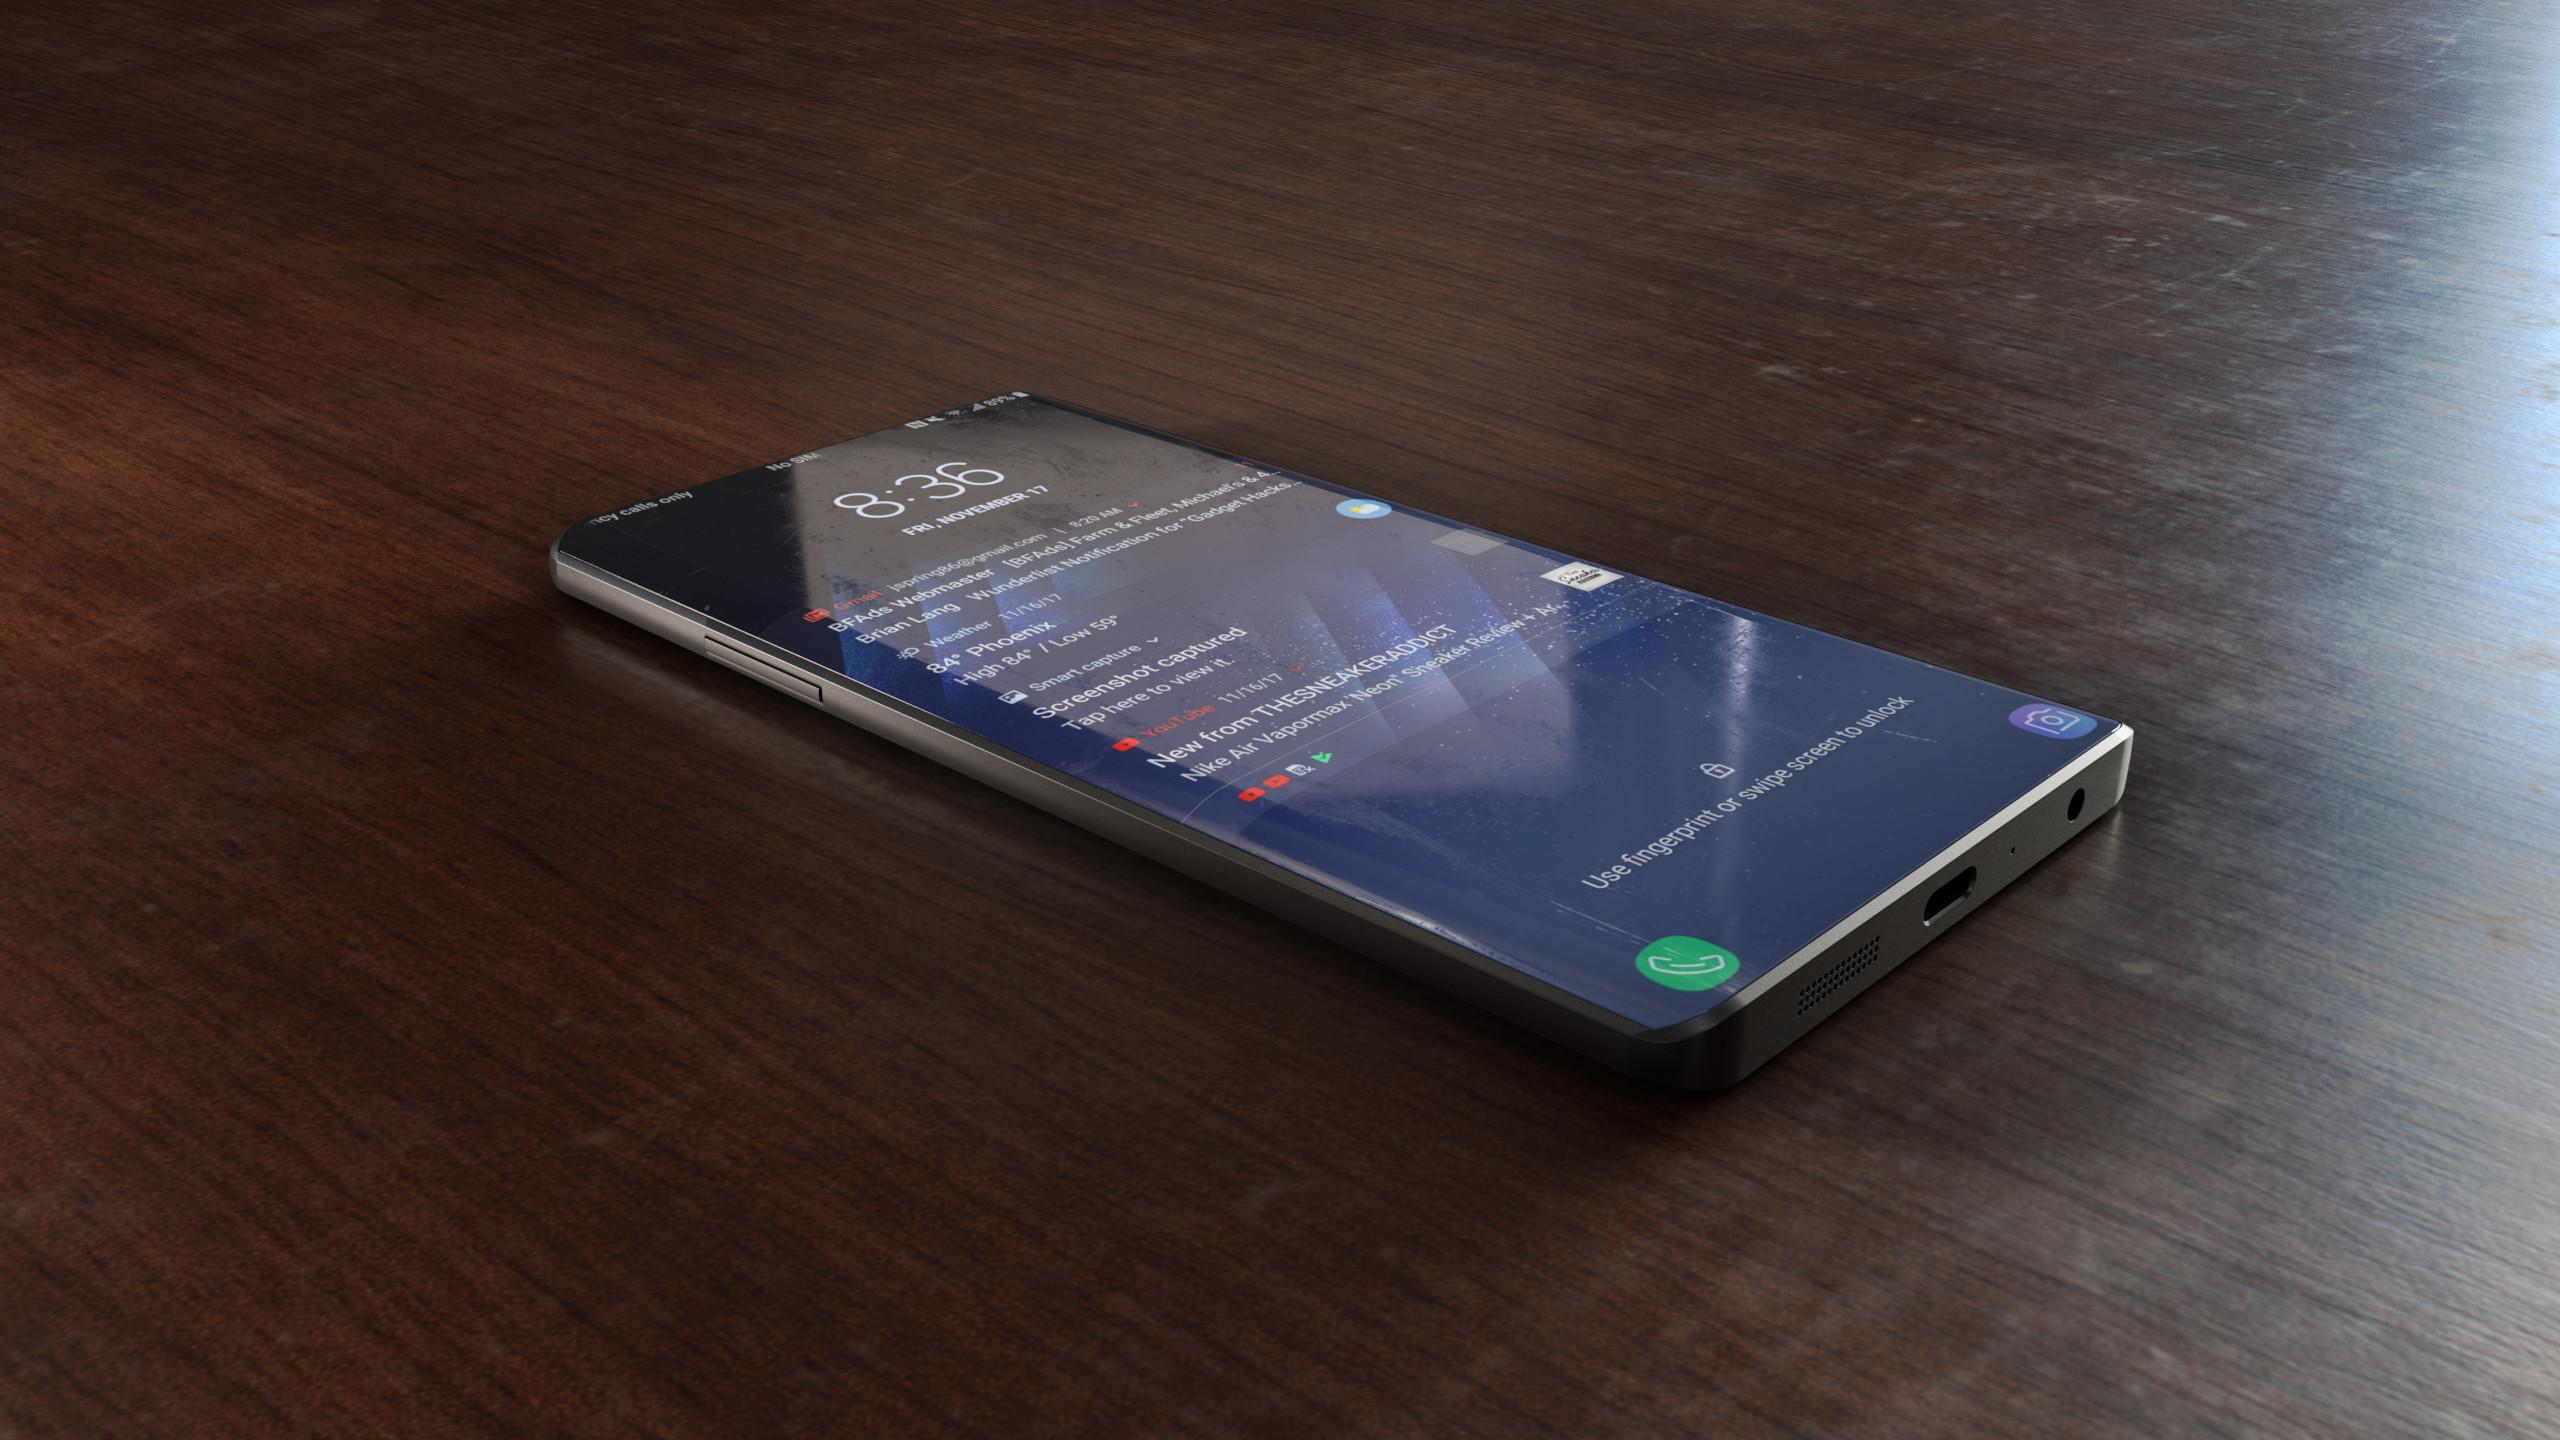 Phone (Screen On)